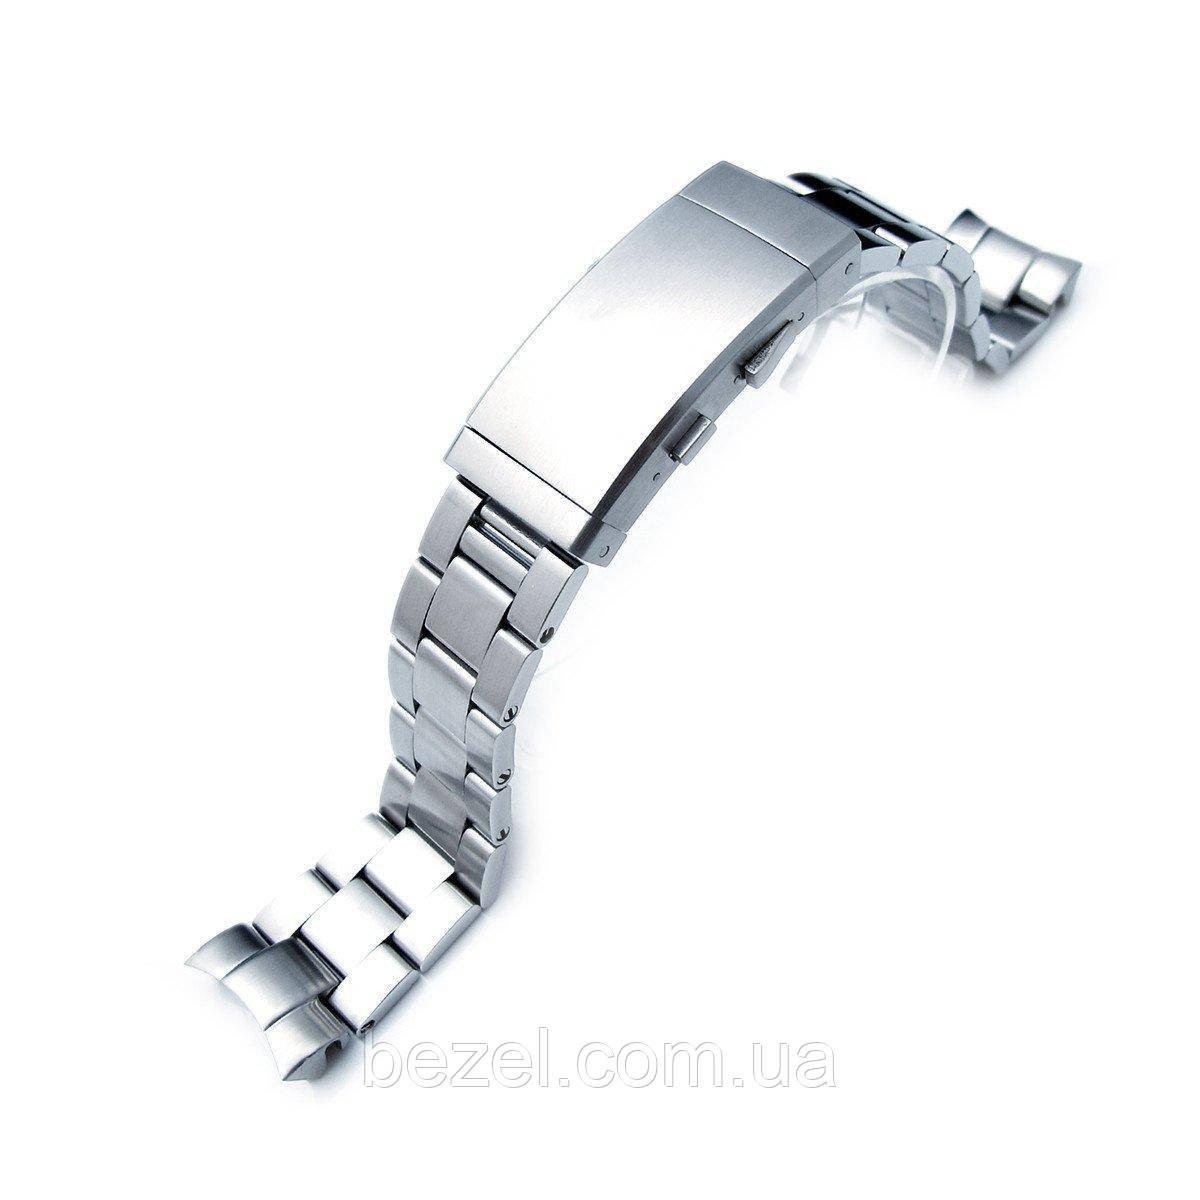 20mm Super Oyster Watch Bracelet for SEIKO Mid-size Diver SKX023, Ratchet Buckle, Brush